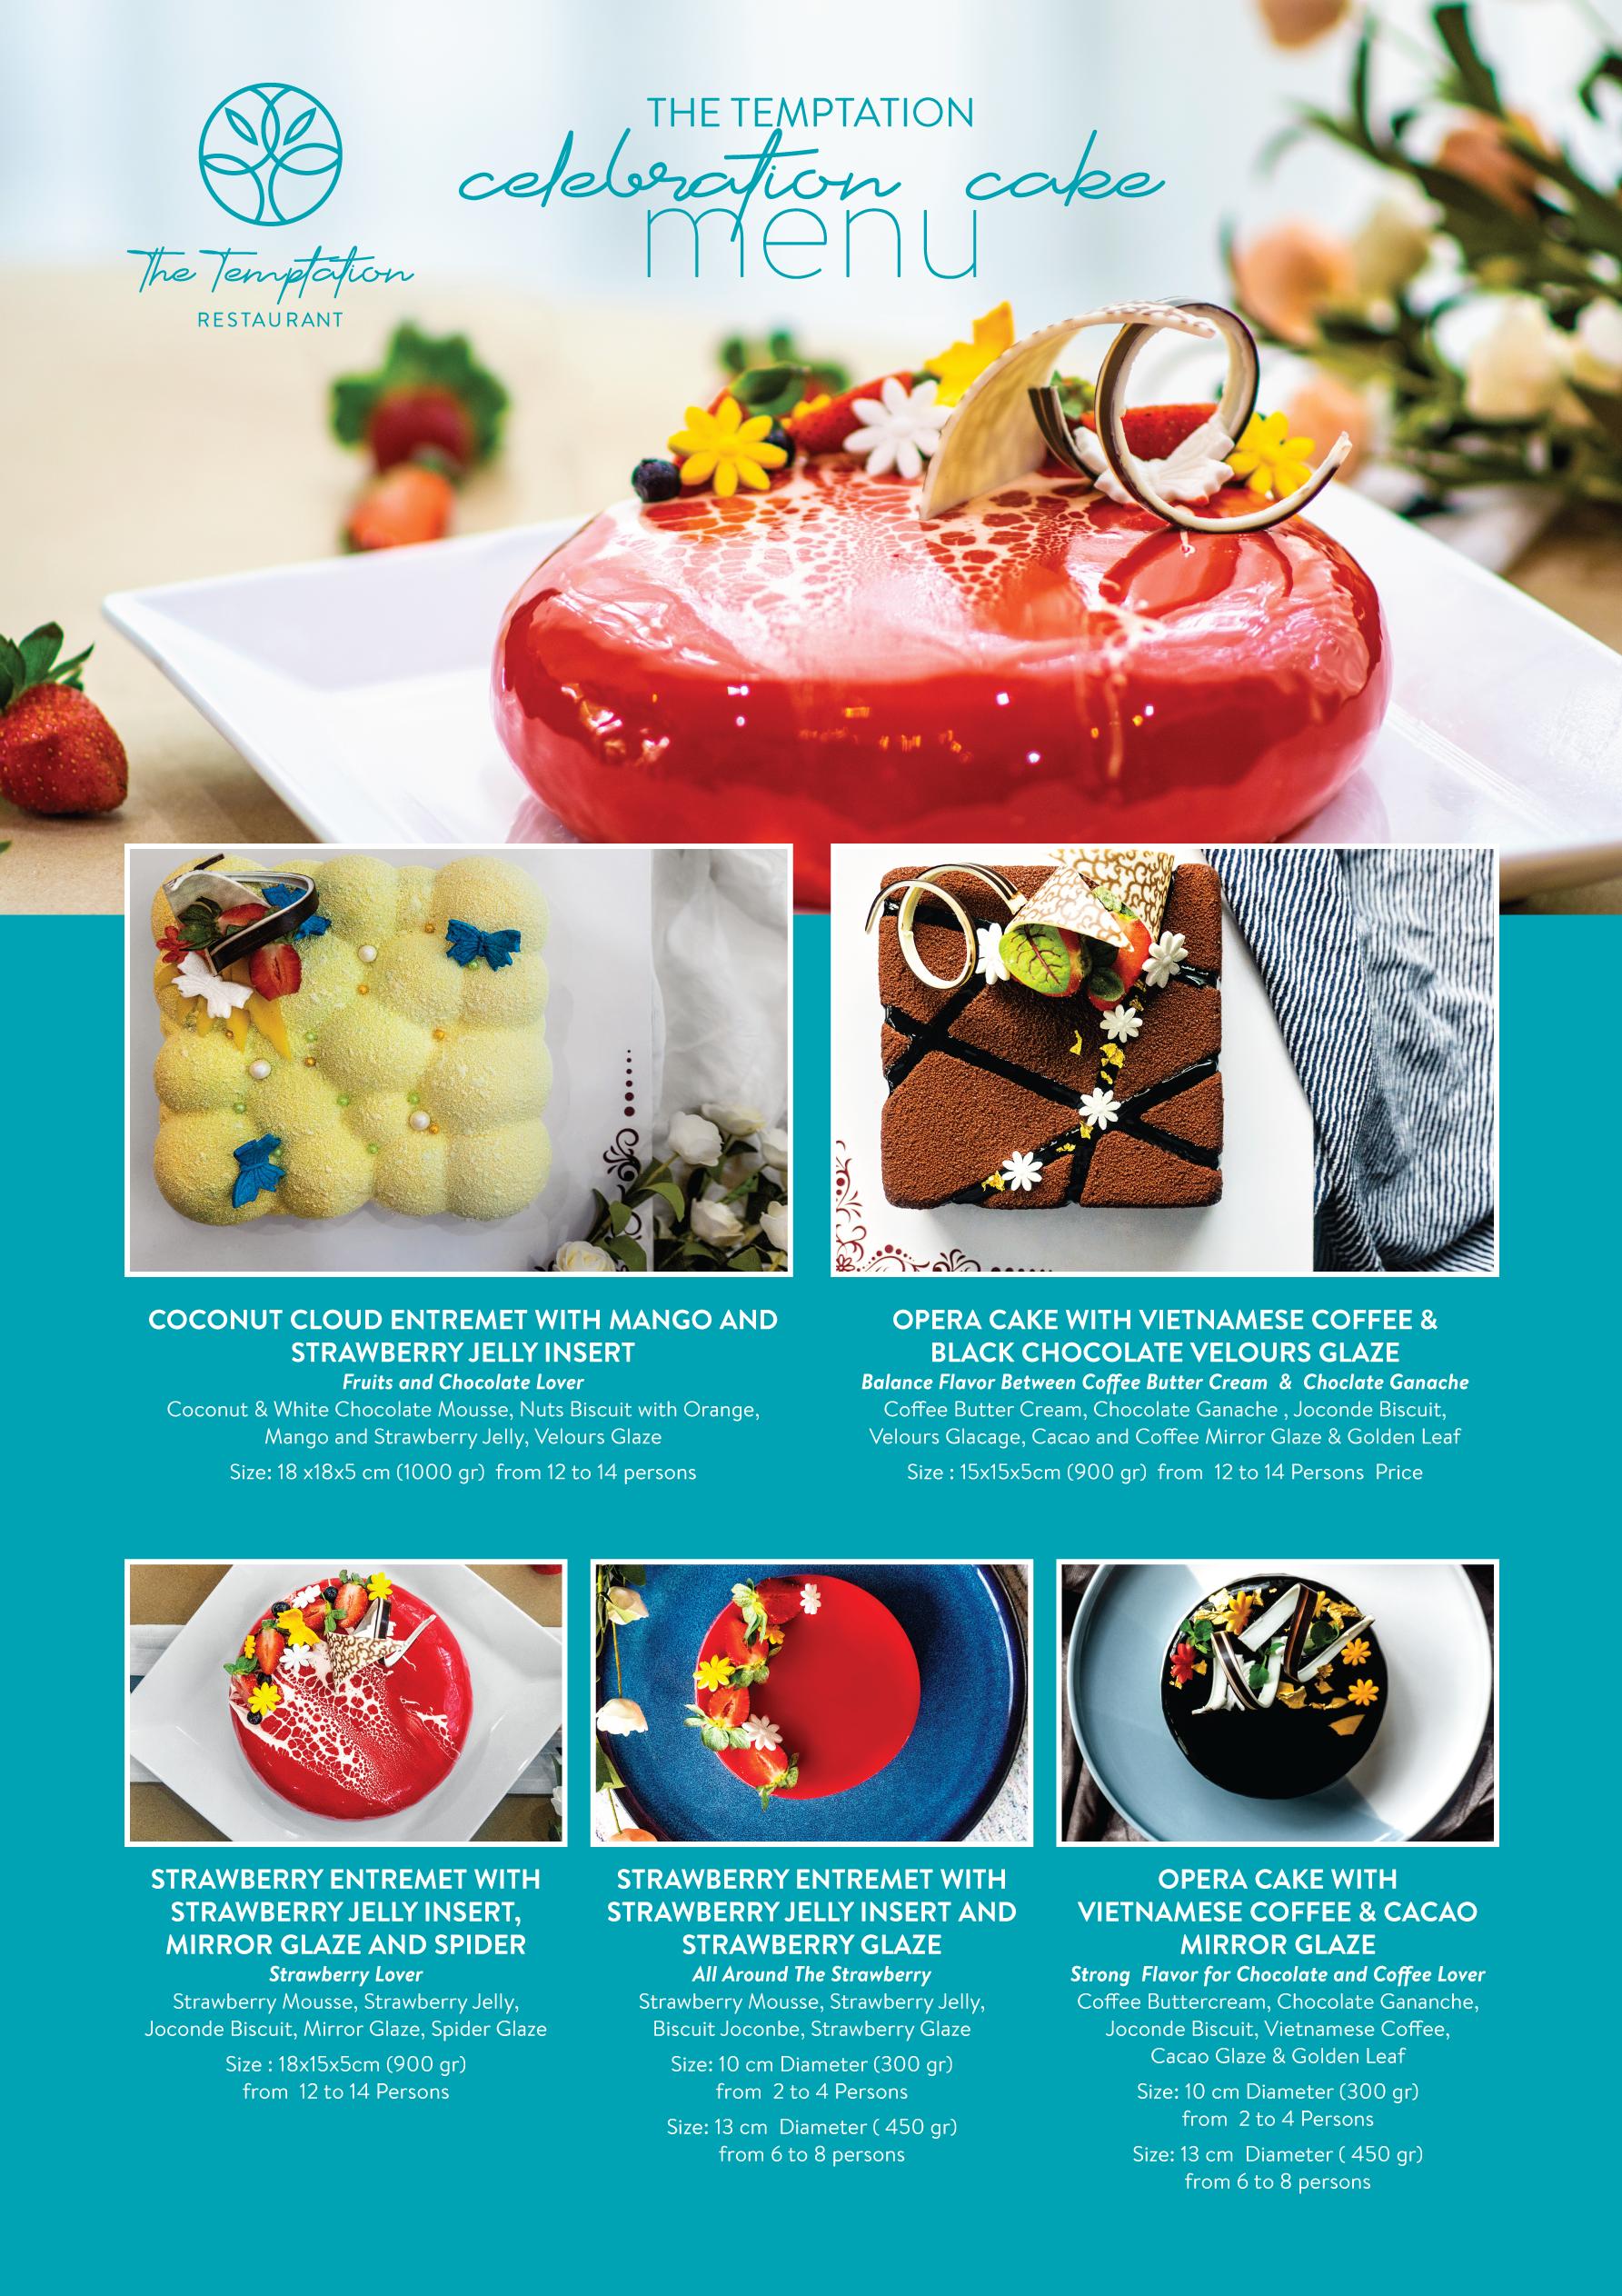 The-Temptation-Celebration-Cake-wothout-price